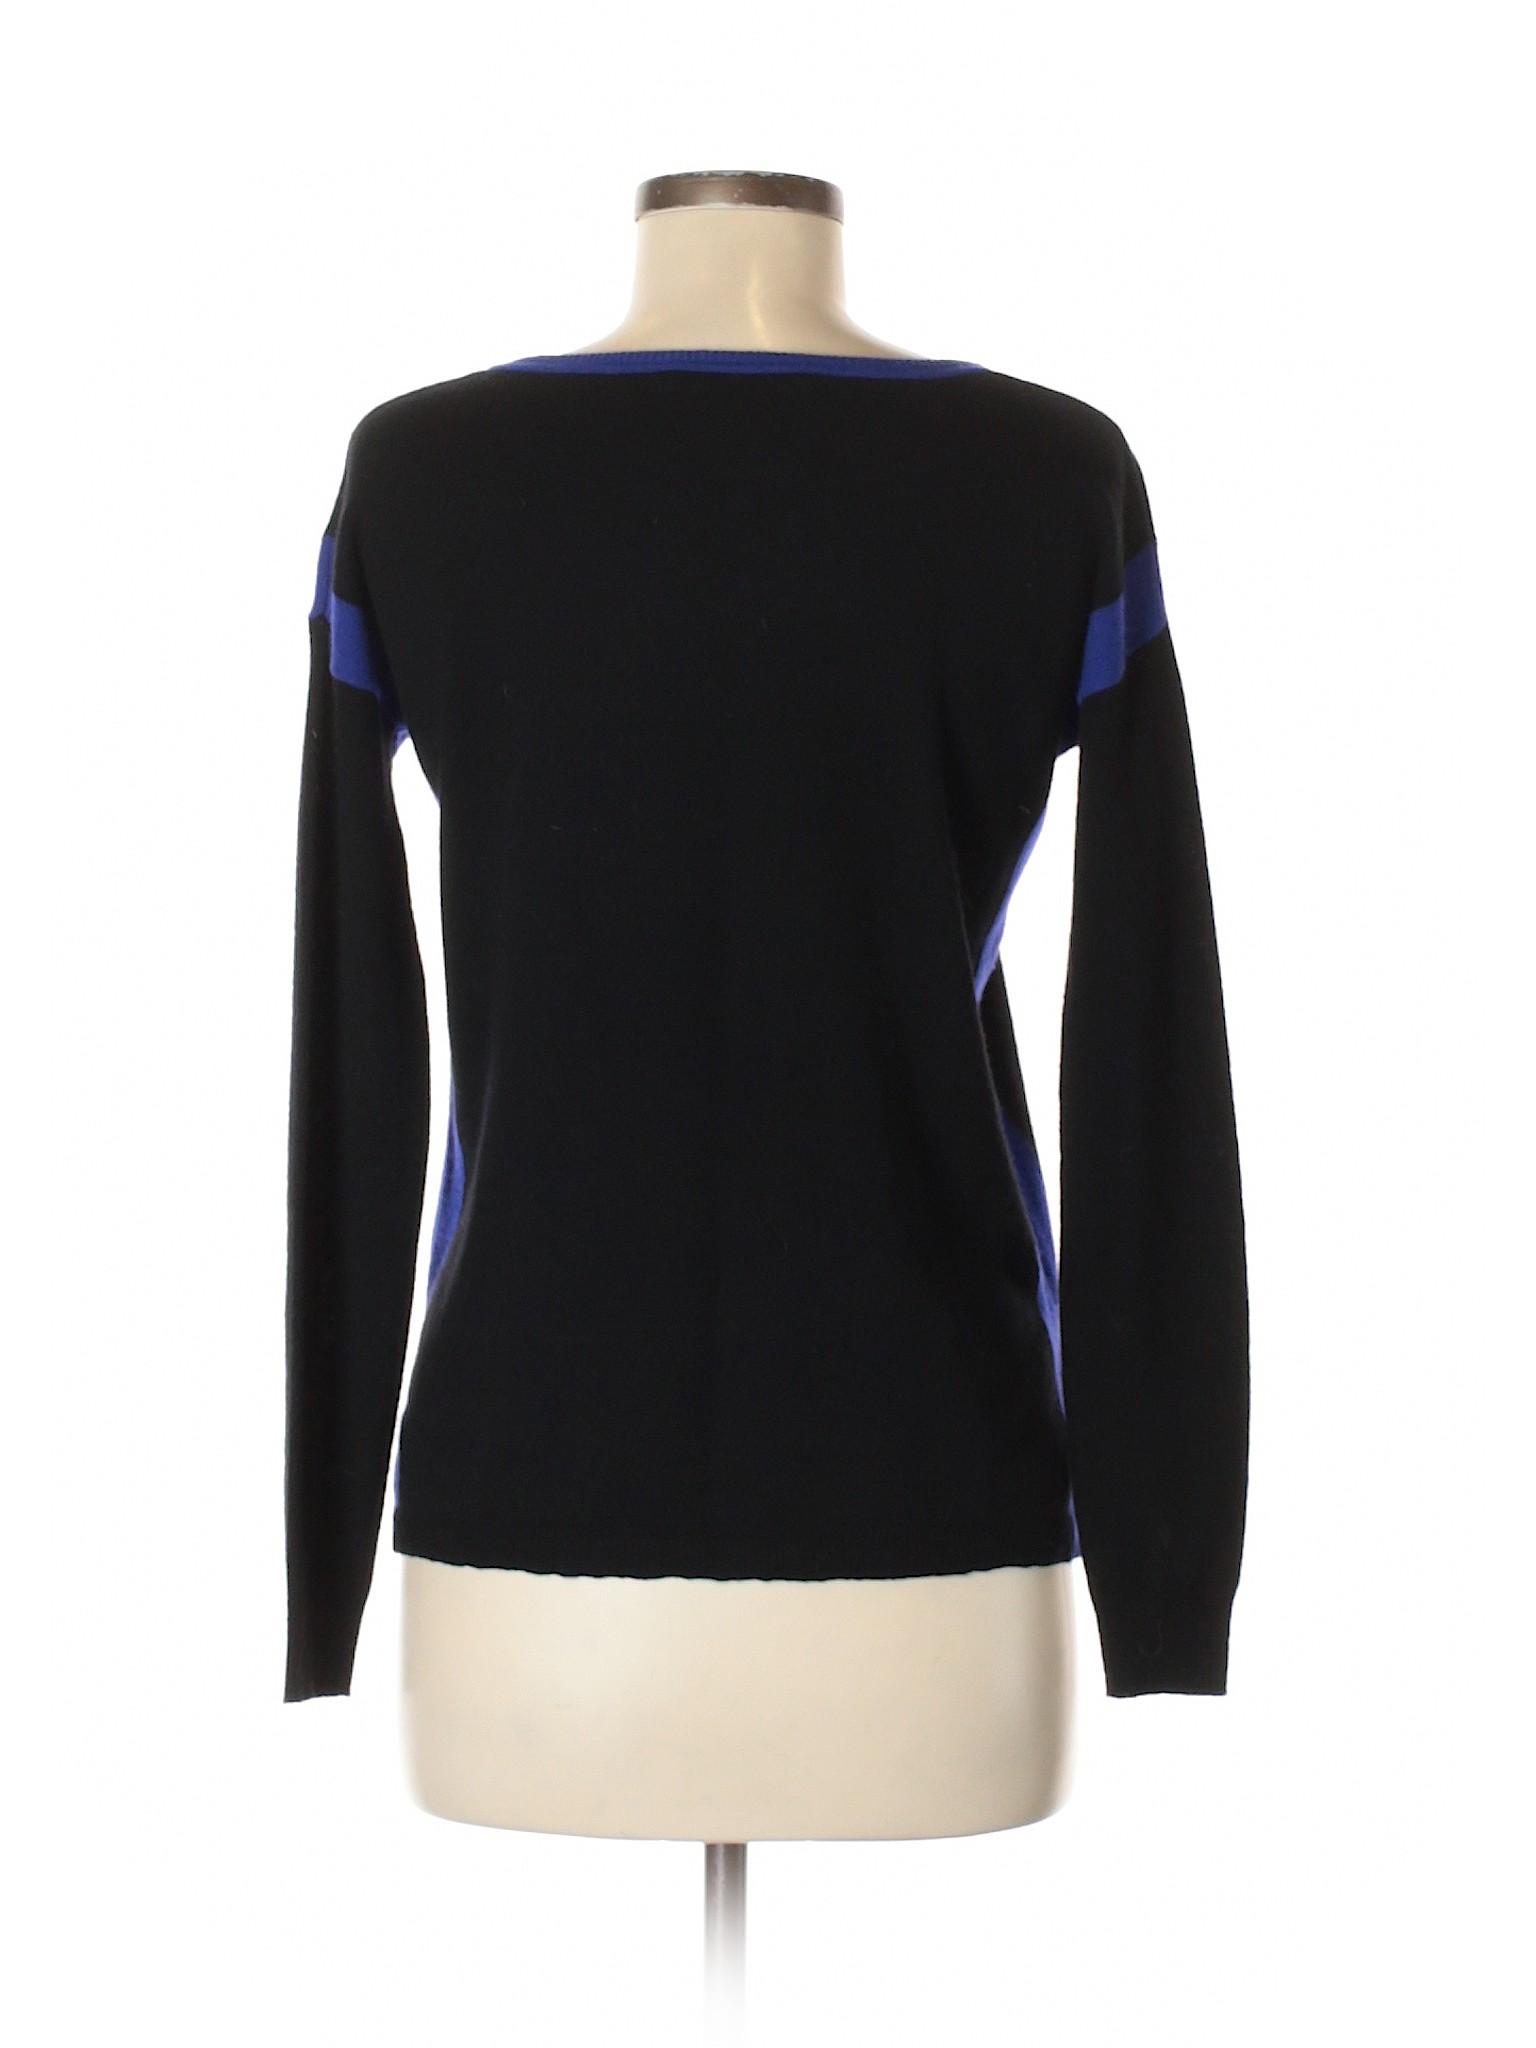 Pullover Boutique Sweater Cashmere Winter Autumn UTOtWz8S